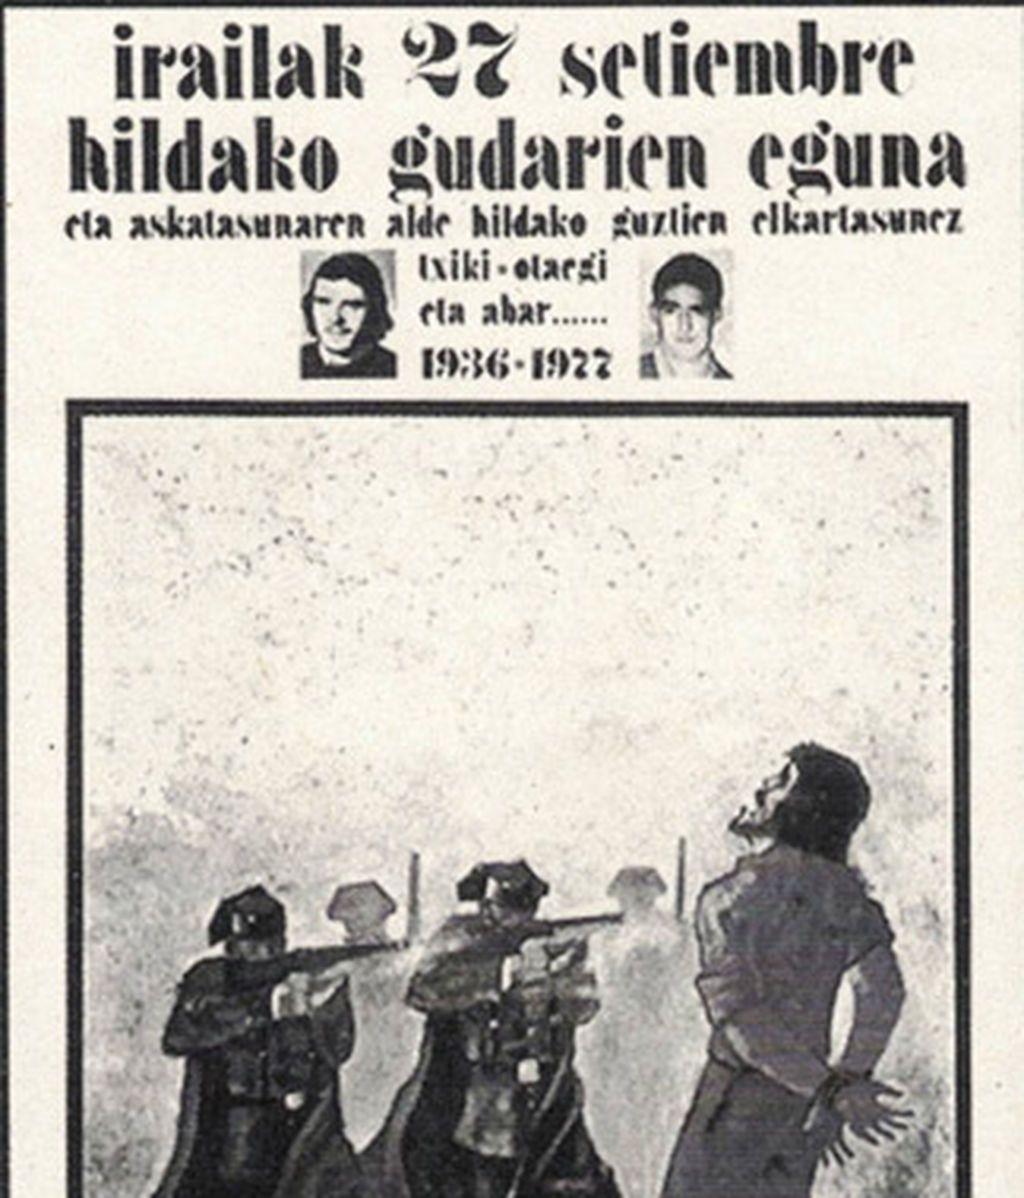 cartelgudari 1977